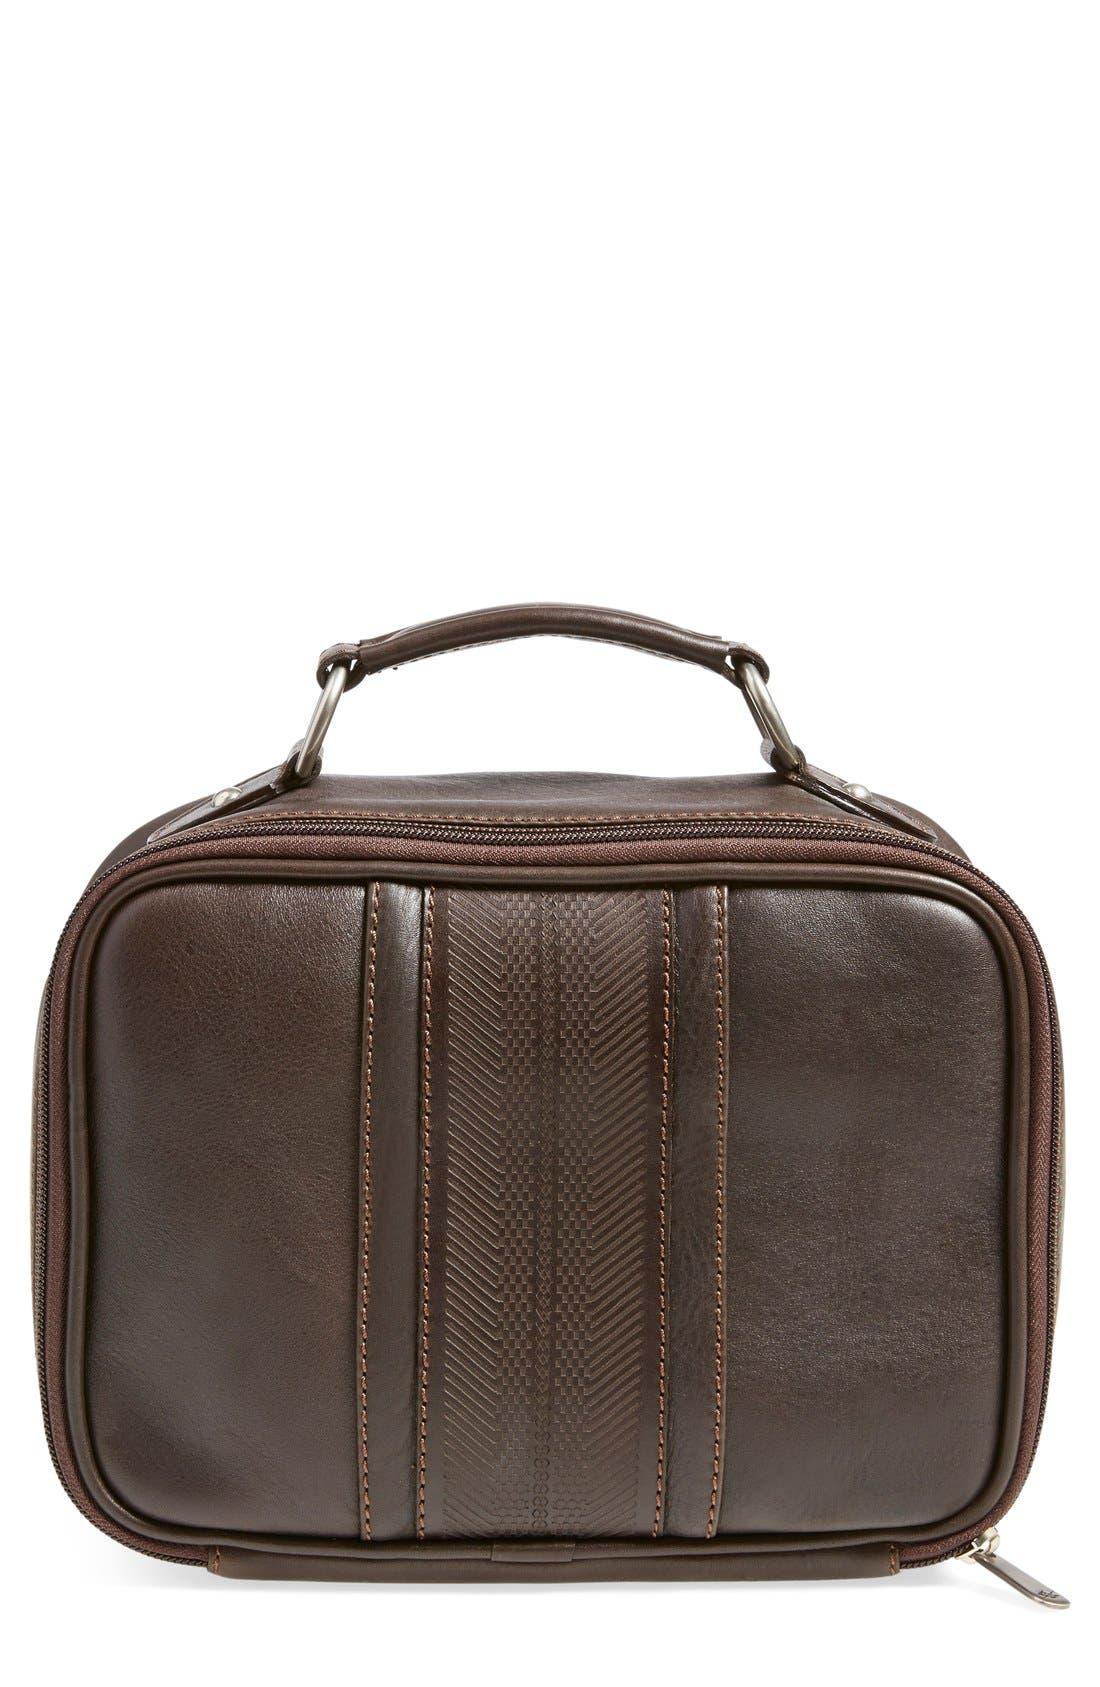 MartinDingman'Rudyard' Leather Travel Kit